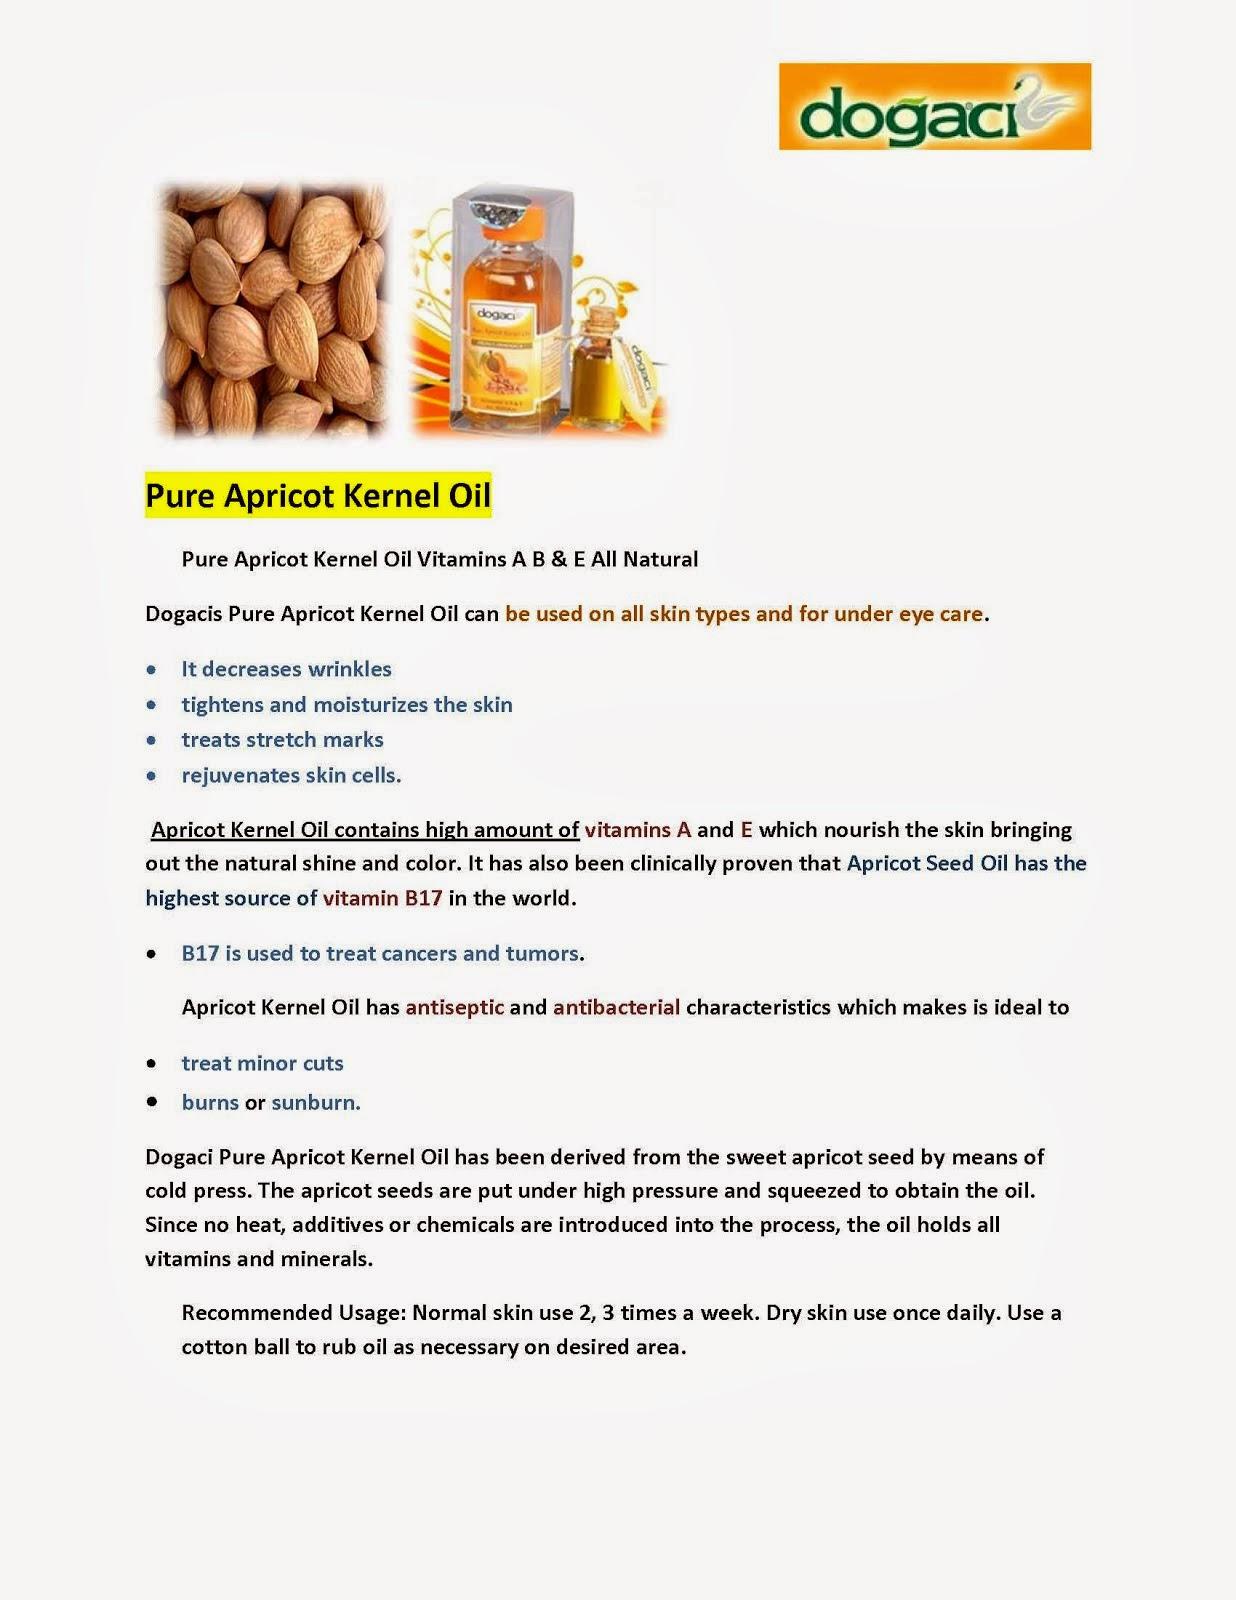 Dogaci Pure Apricot Kernel Oil